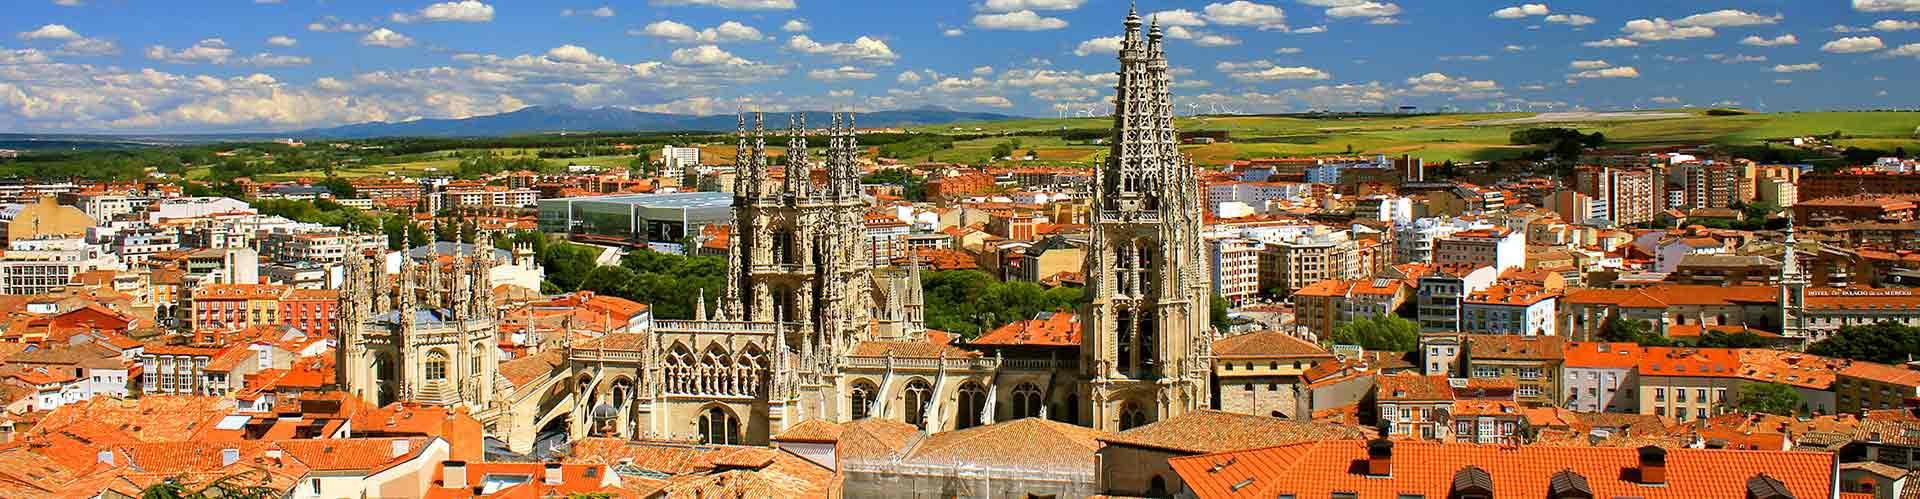 free tour Burgos - Turismo de España